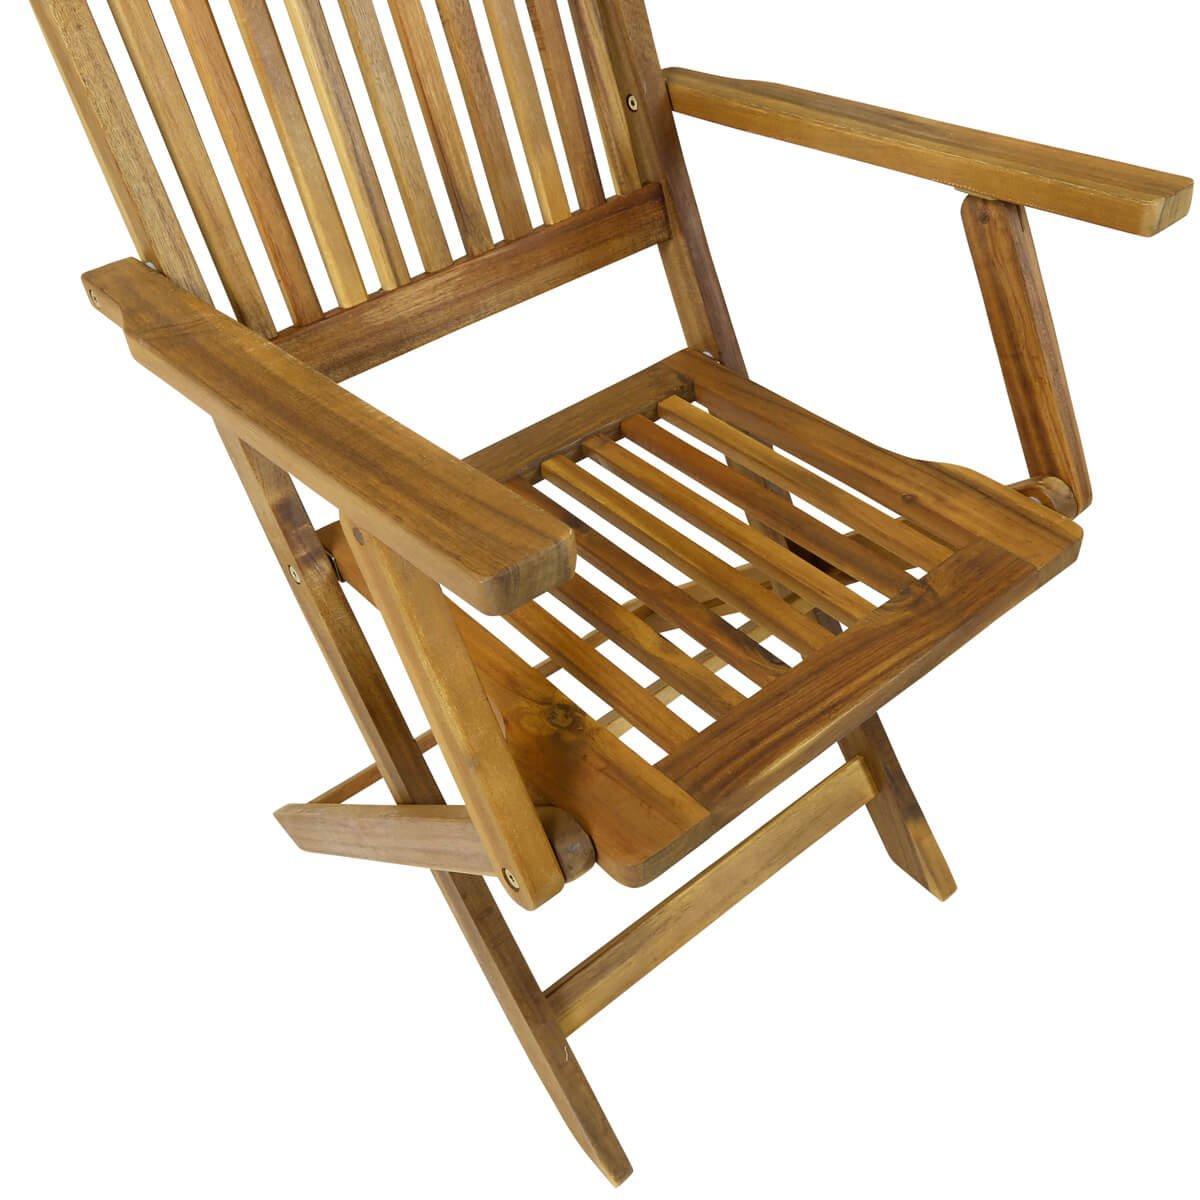 Charles Bentley Garden Hardwood Oval Wooden Garden Patio Furniture Set  Extendable Table U0026 6 Chairs: Amazon.co.uk: Garden U0026 Outdoors